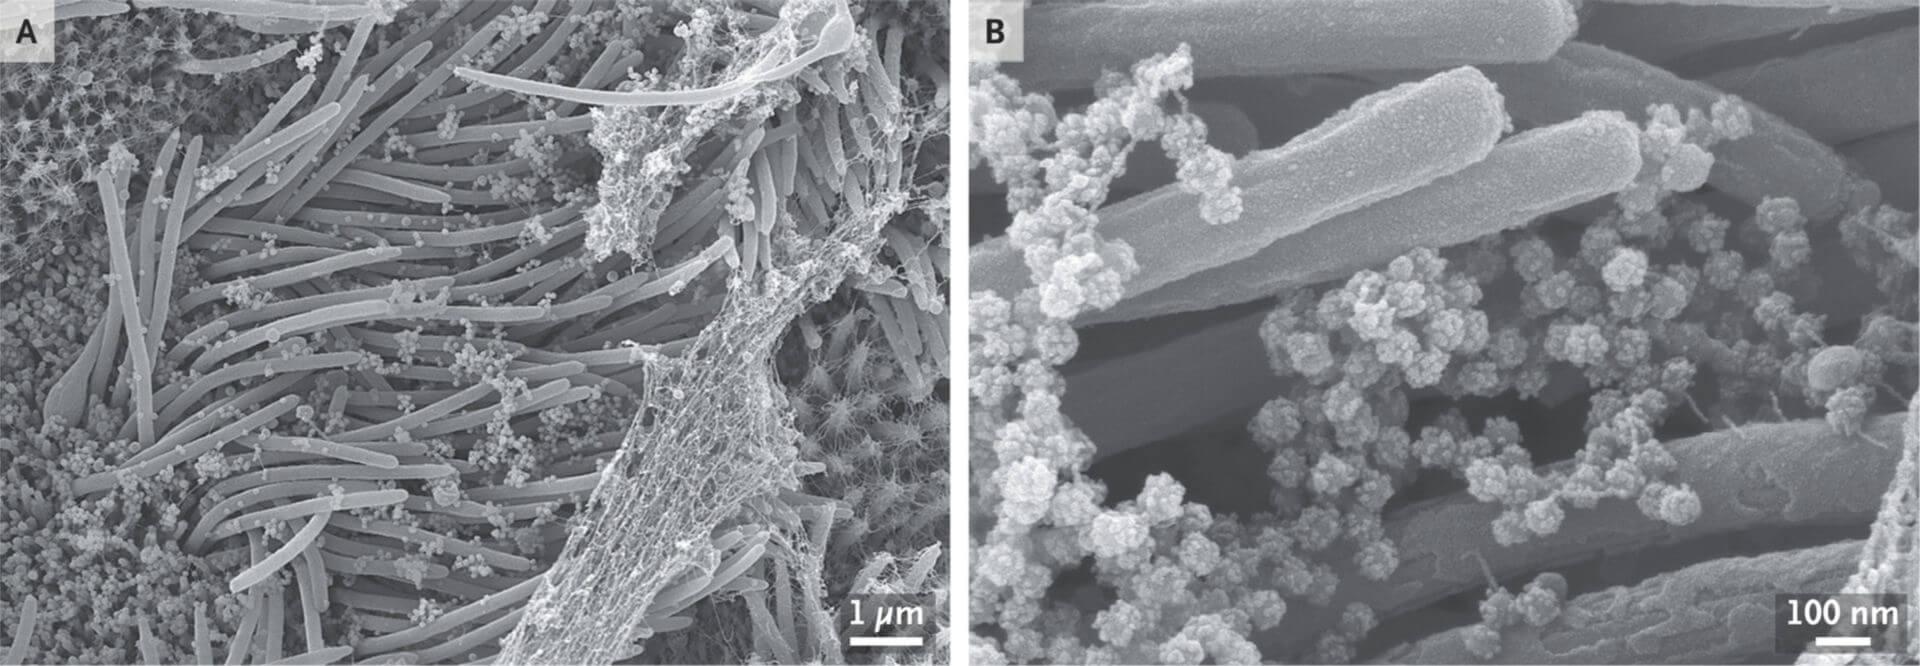 SARS-CoV-2 unterm Mikroskop